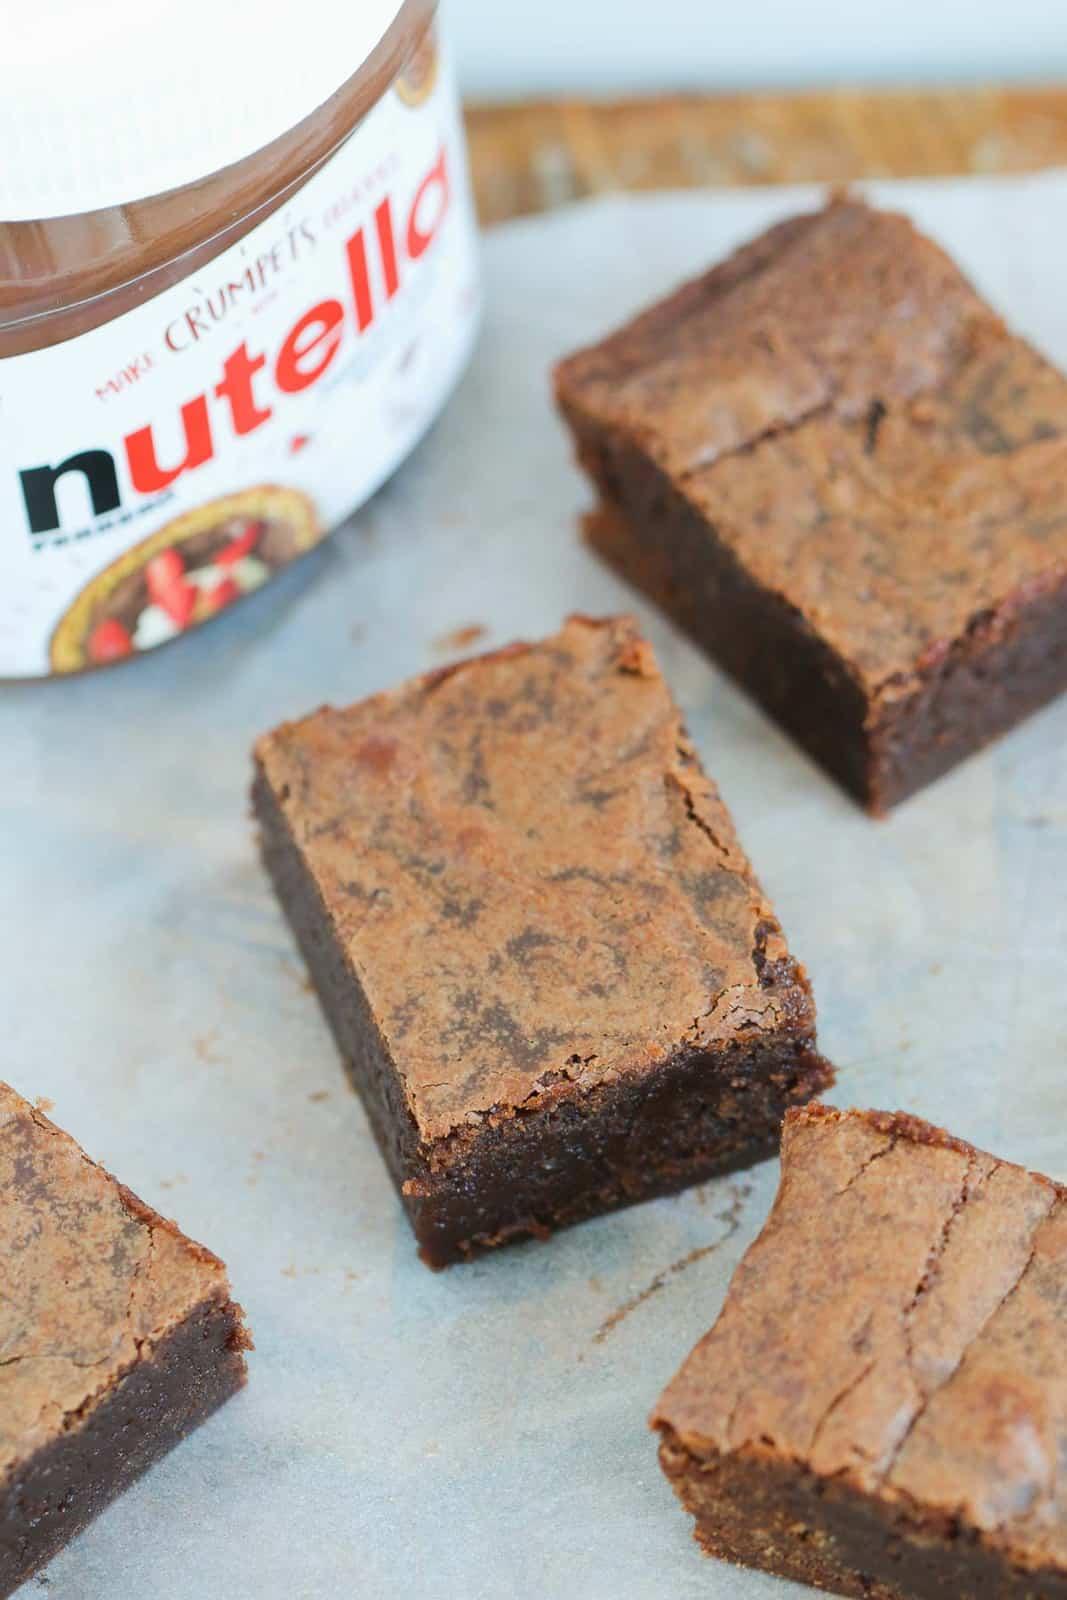 A jar of Nutella chocolate hazelnut spread next to pieces of gooey chocolate brownies.